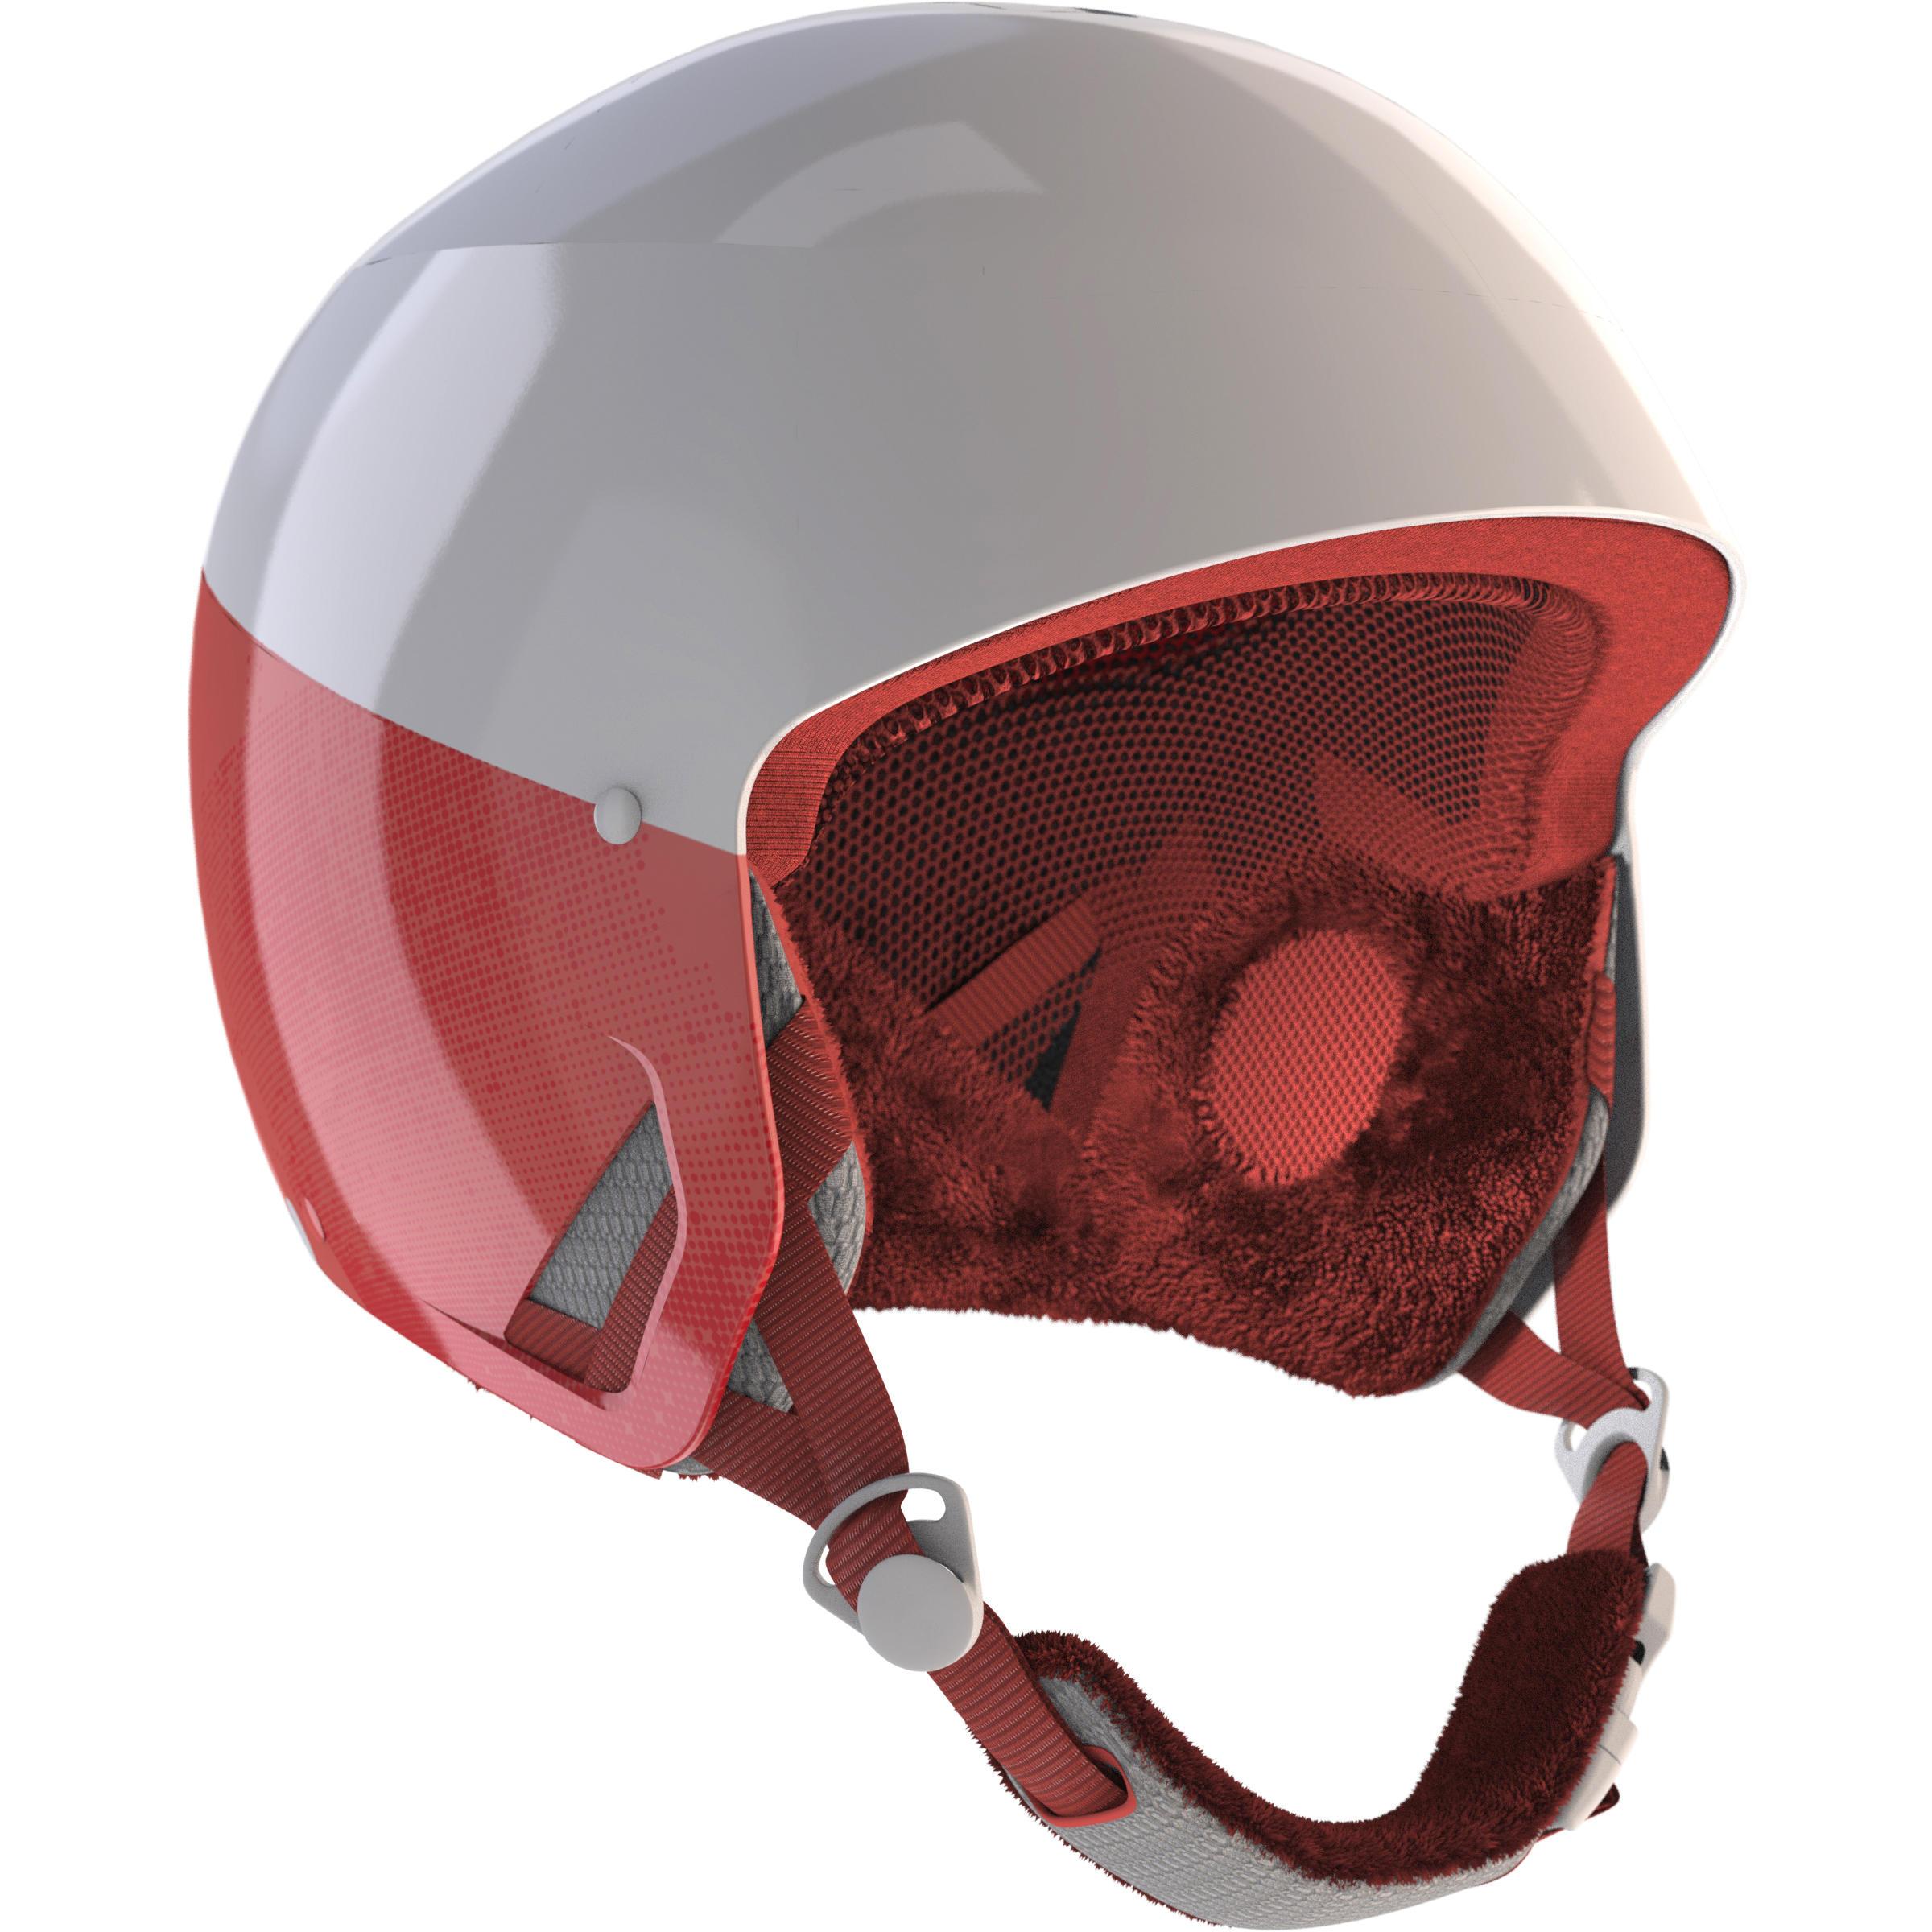 CASQUE DE SKI ADULTE H-RC 500 BLANC ET ROSE